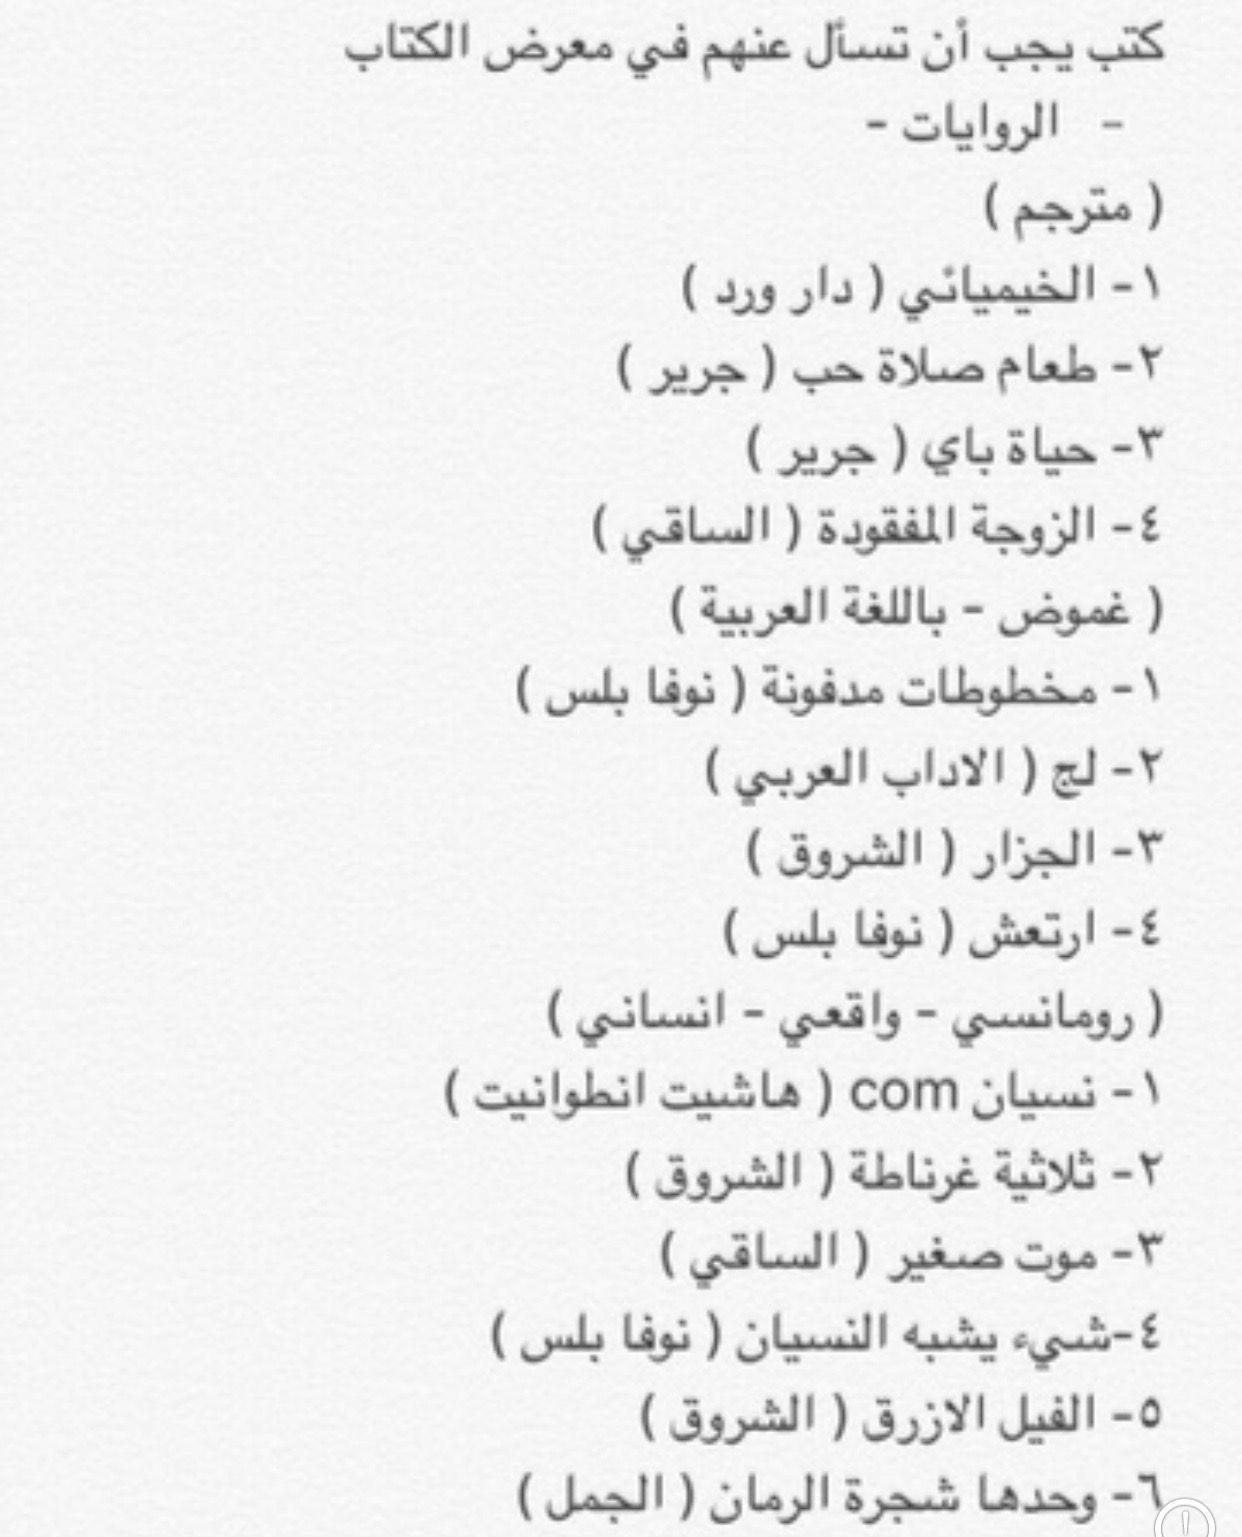 Pin By Lina Az On Books Books Book Qoutes Arabic Books